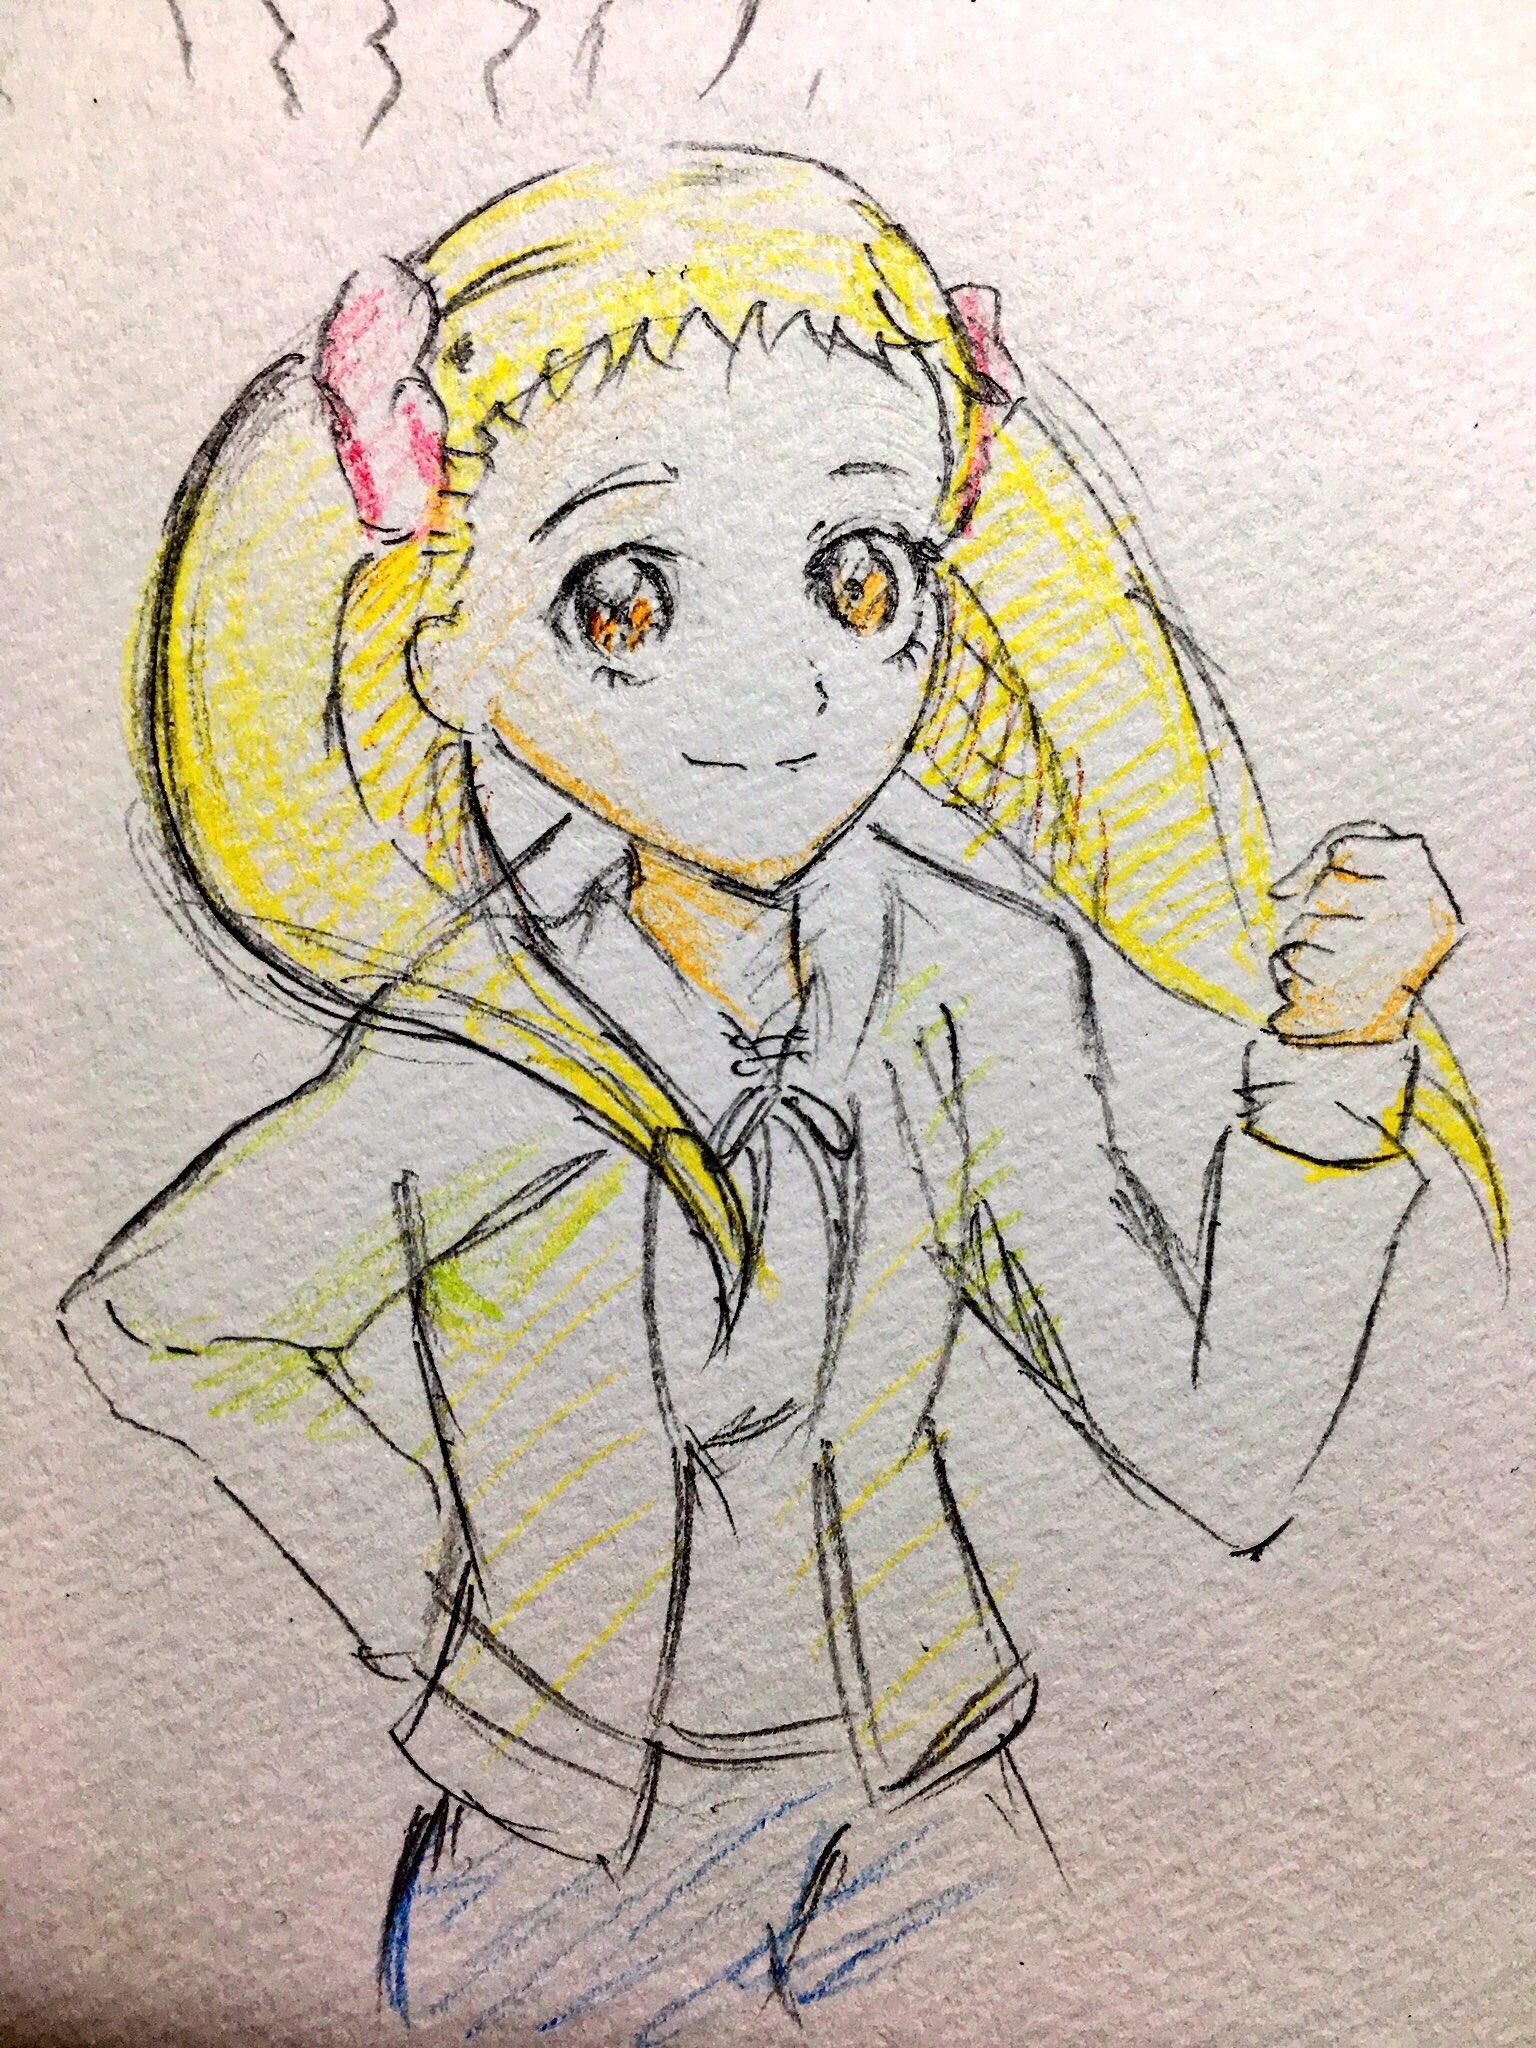 Jnaさん (@jina_ura99)さんのイラスト